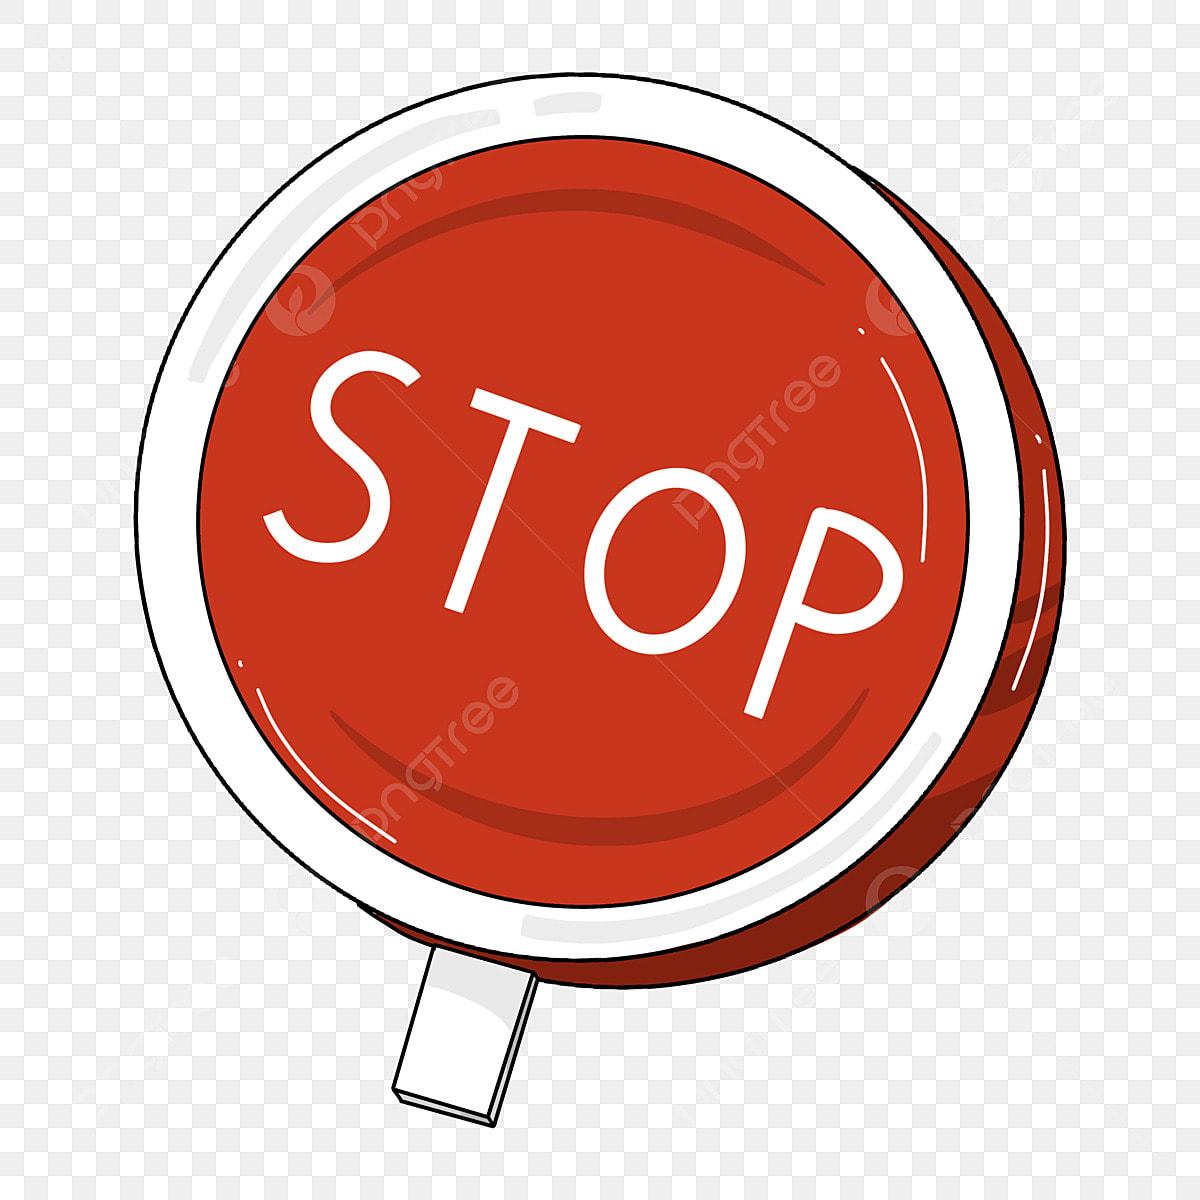 停止 警告 サイン 警告看板イラストを停止, 警告, 停止, 警告看板 ...